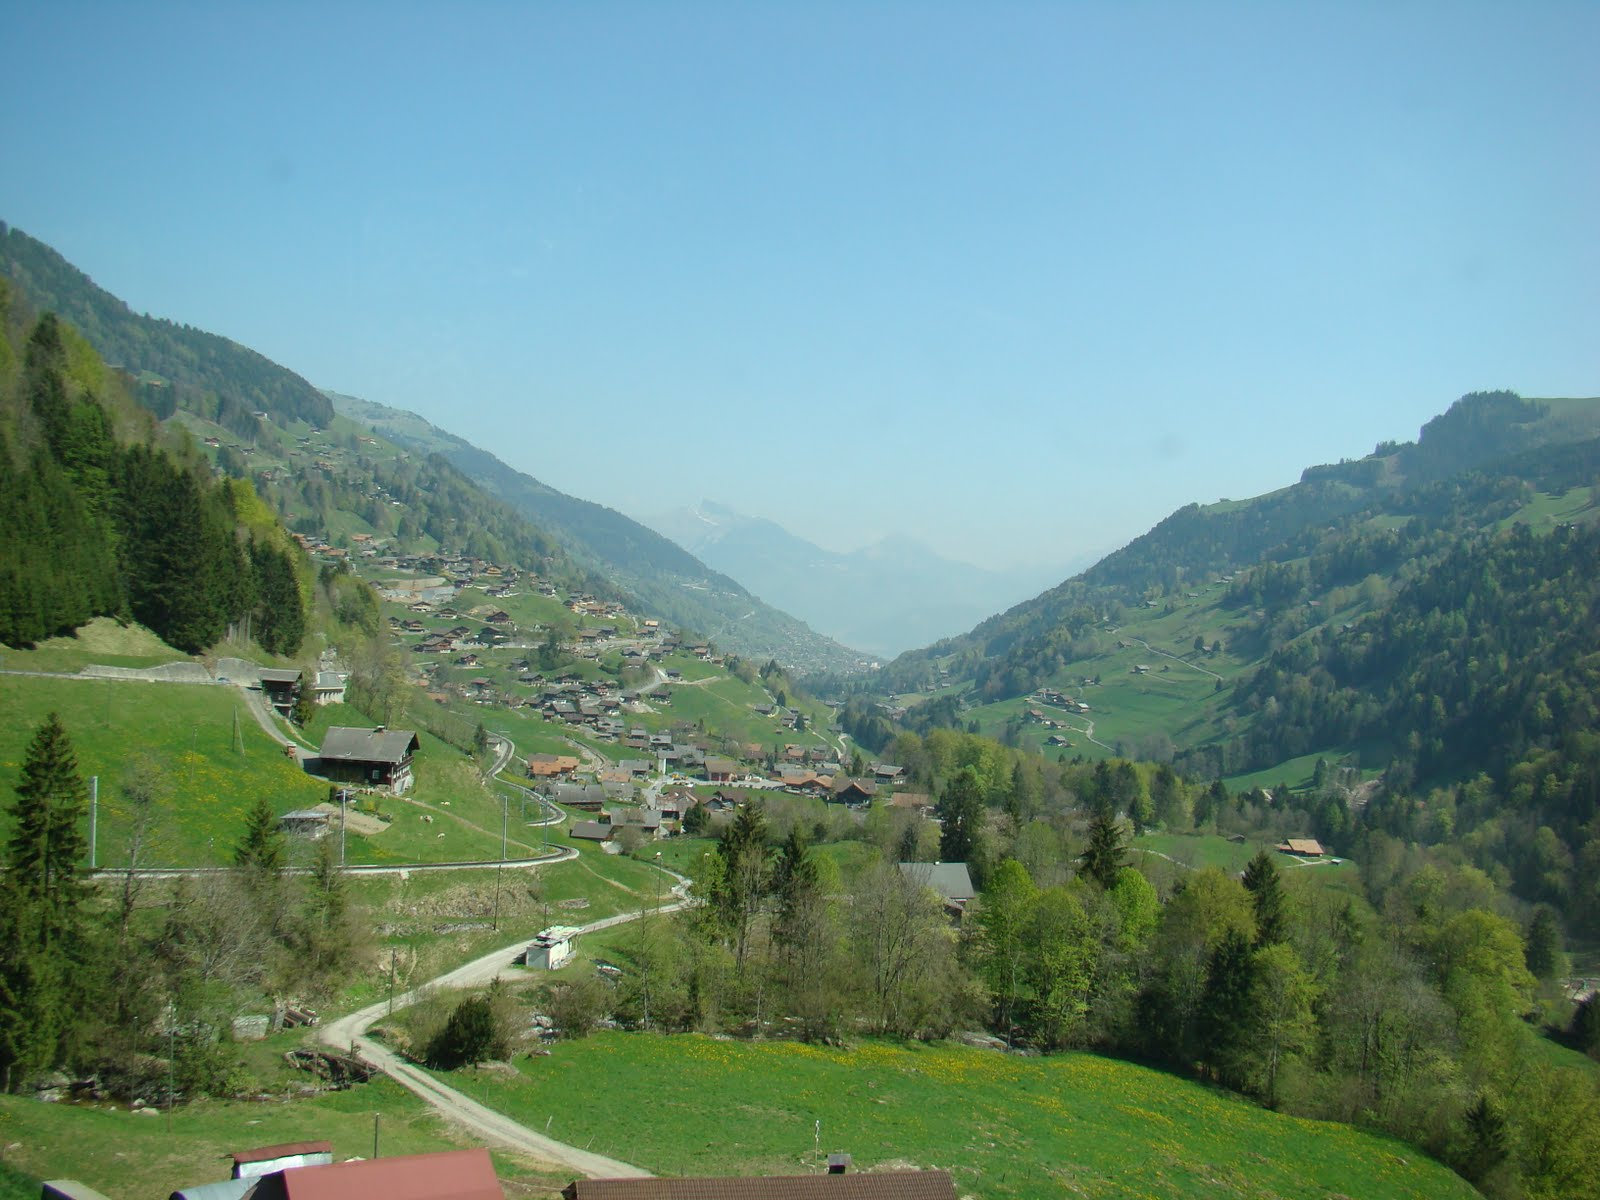 Lost in switzerland a foreign adventure adventure 9 0 - Lyon to geneva bus ...